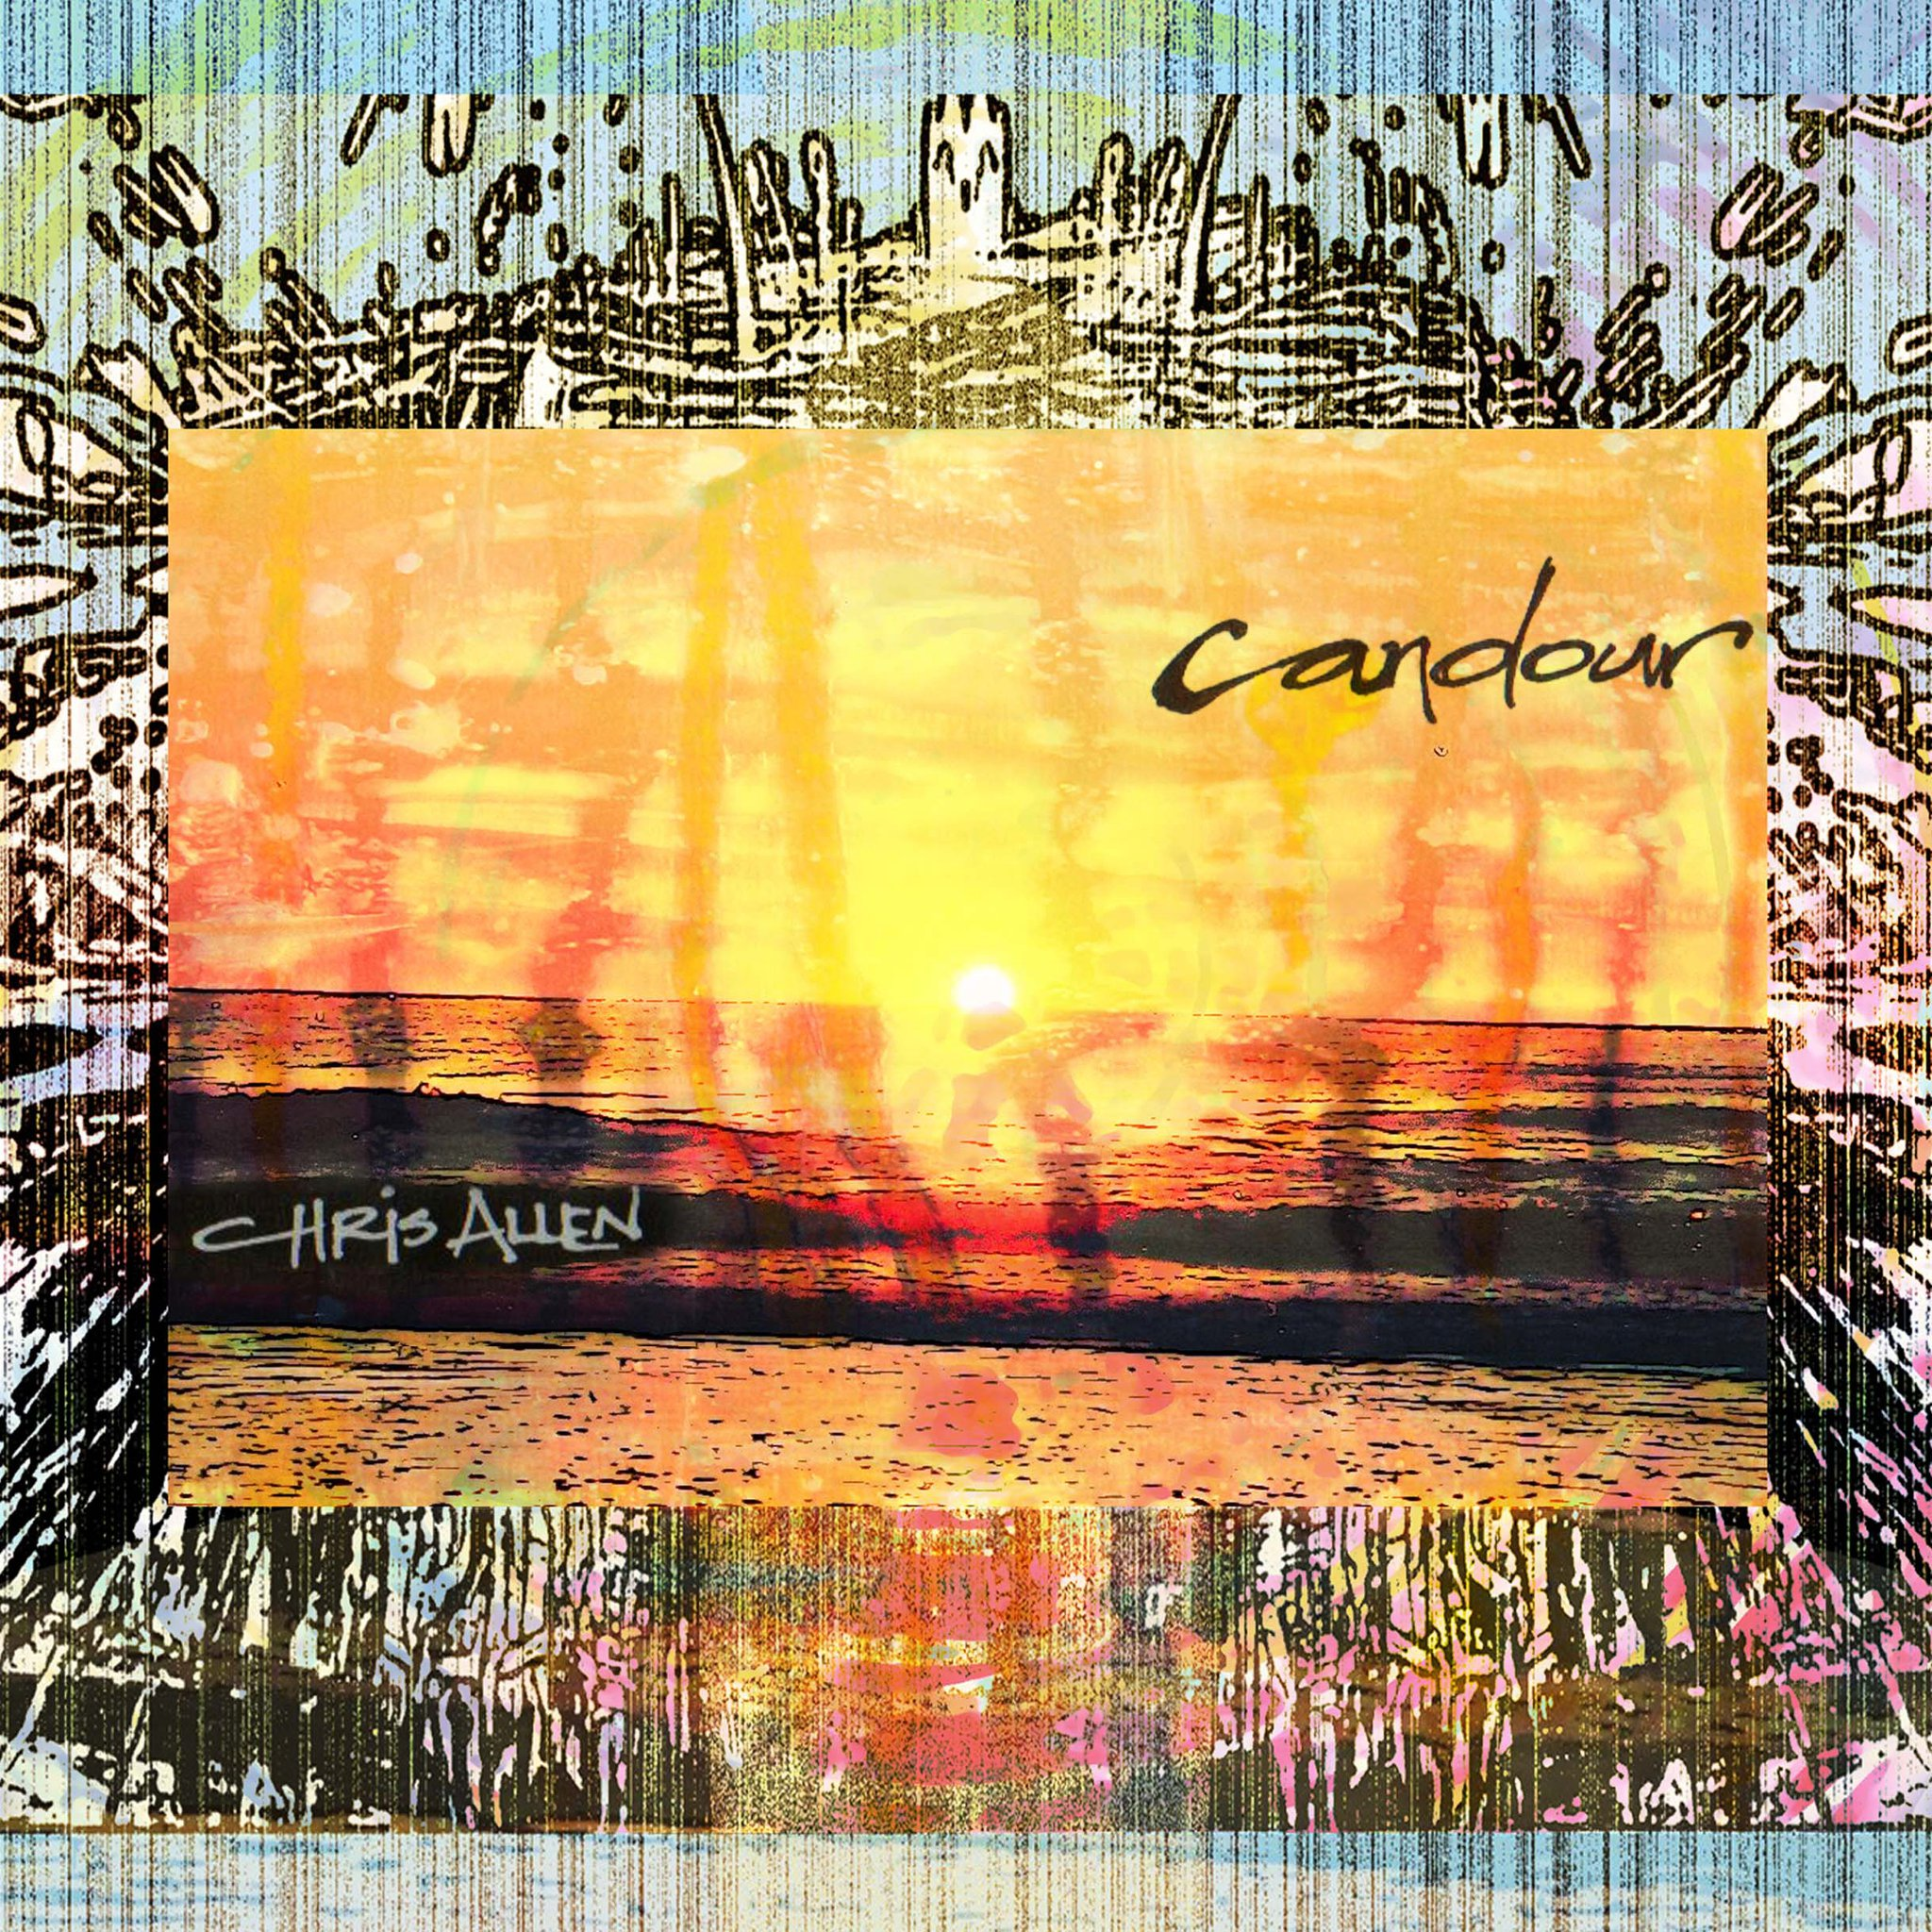 Chris Allen 'Candour' album cover